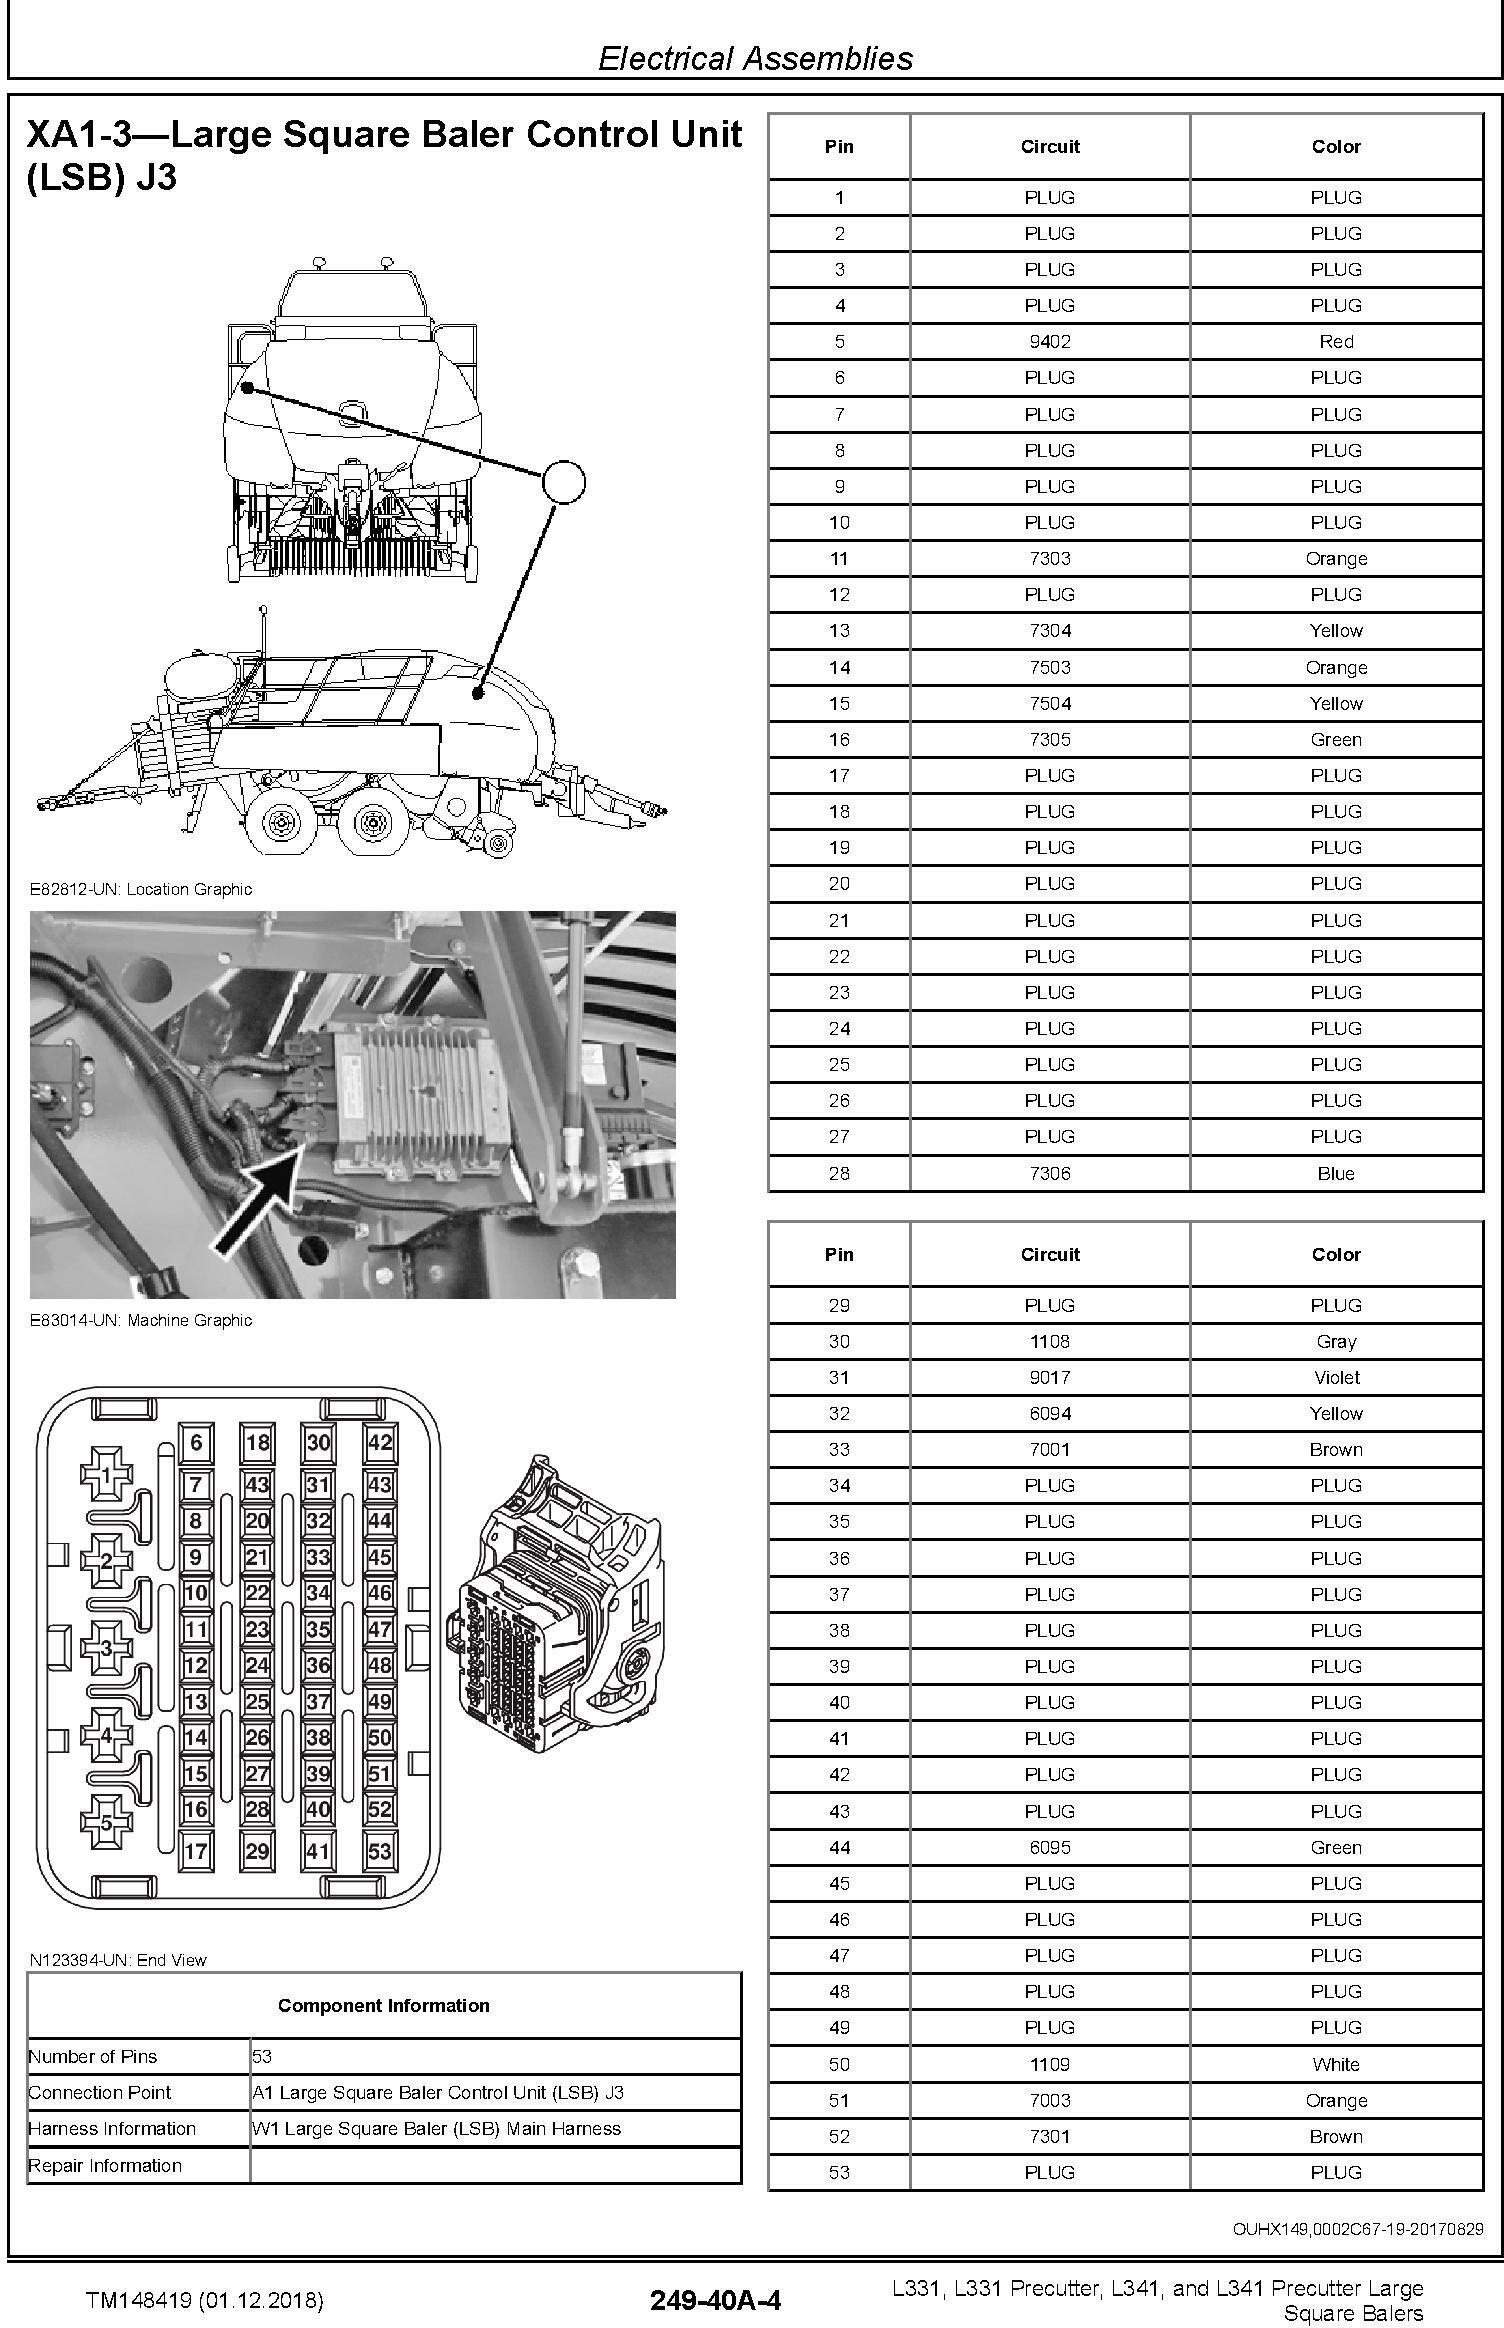 JD John Deere L331/Precutter, L341/ Precutter Large Square Balers Repair Technical Manual (TM148419) - 1